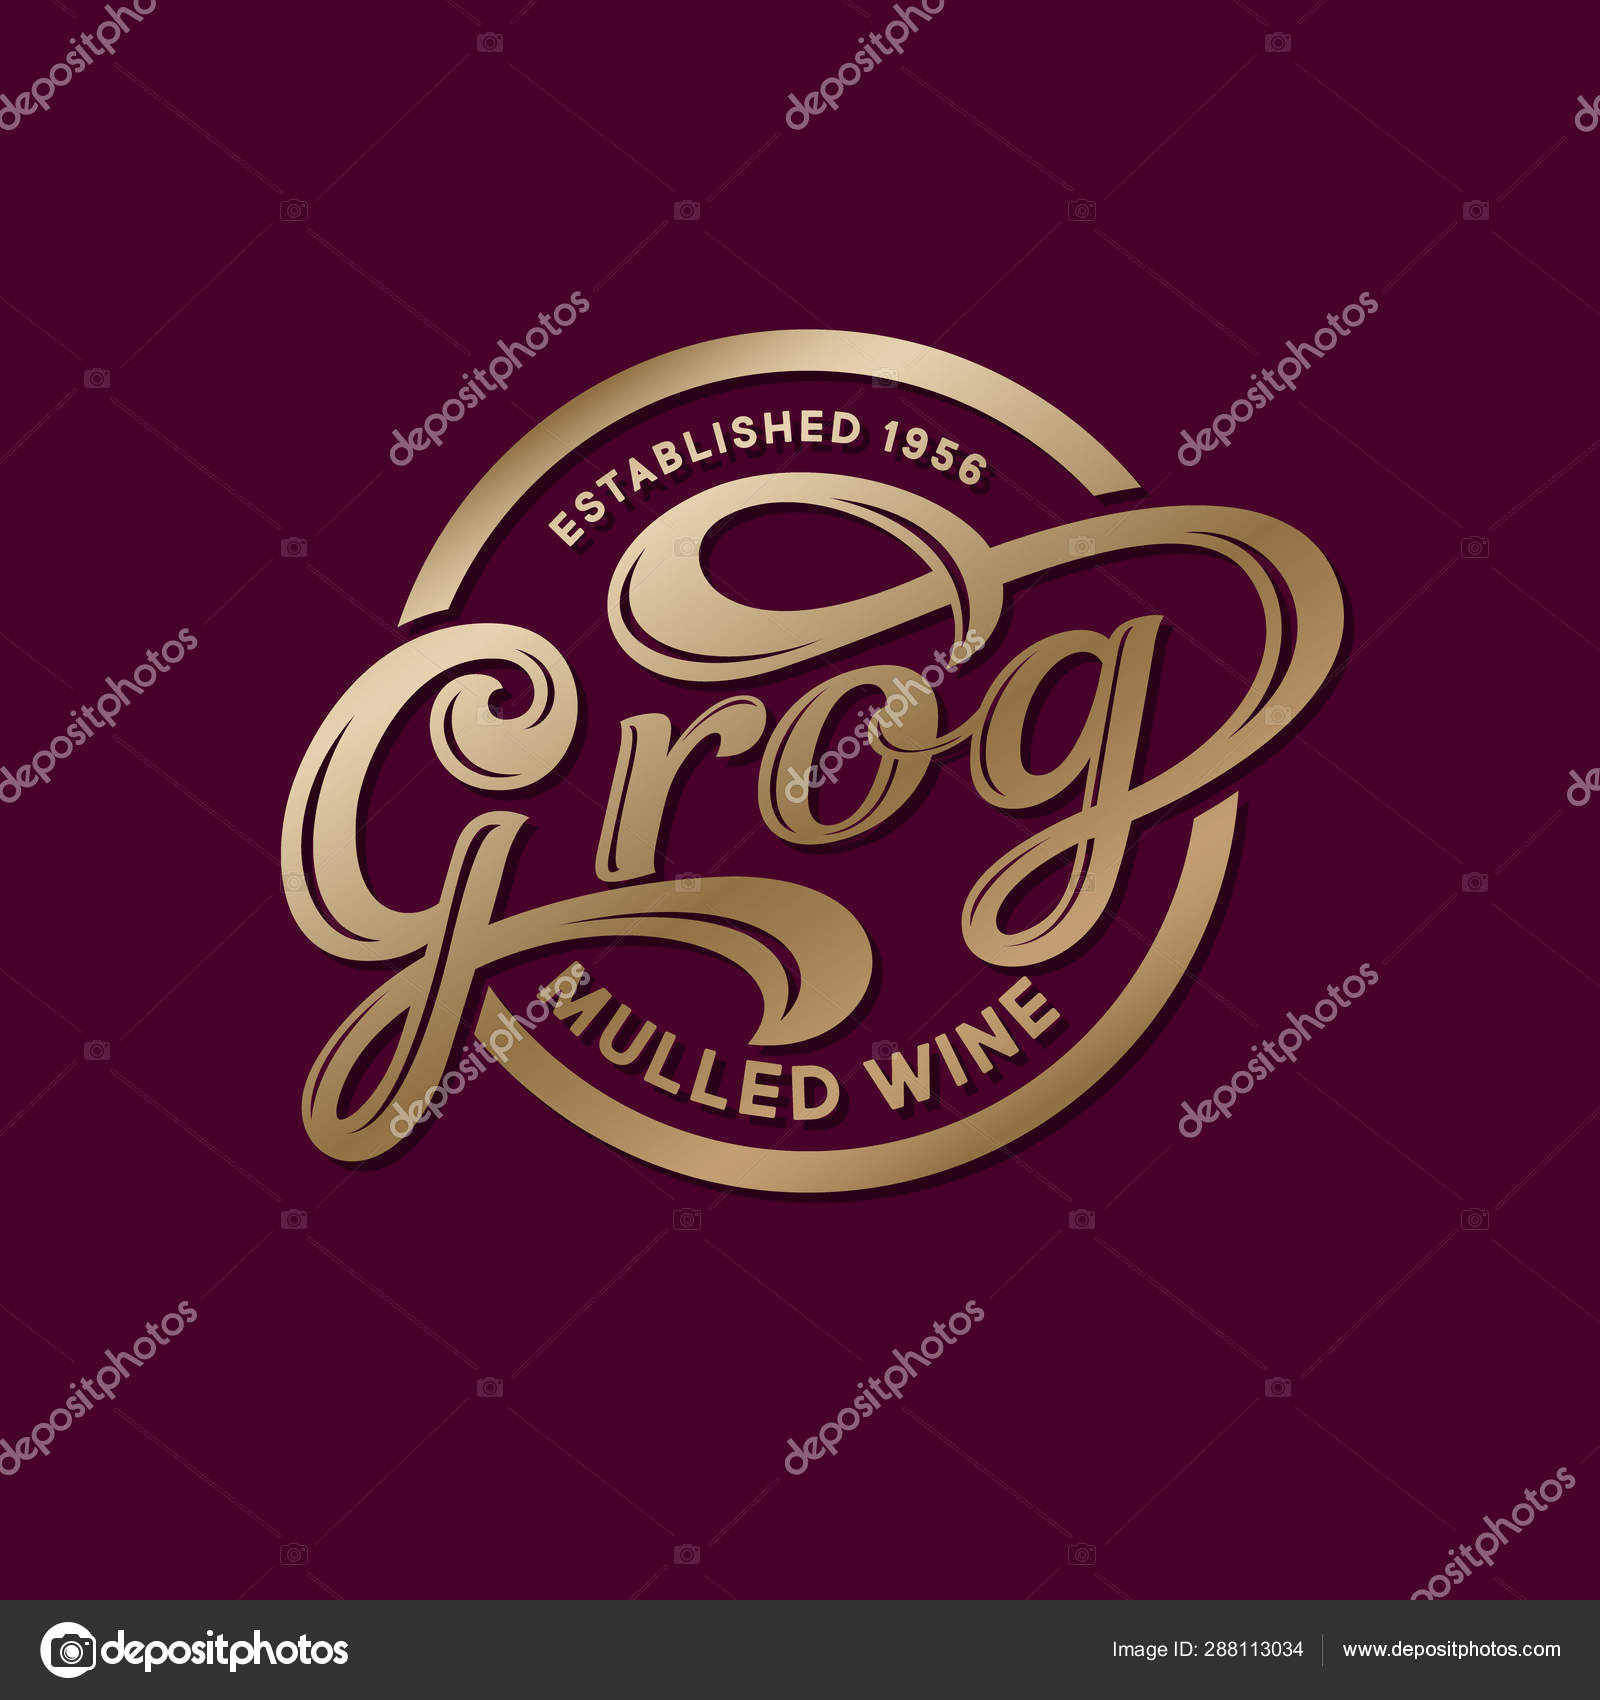 Grog Logo Mulled Wine Cafe Wine Restaurant Logo Gold Calligraphic Stock Vector C Nataly 314 288113034